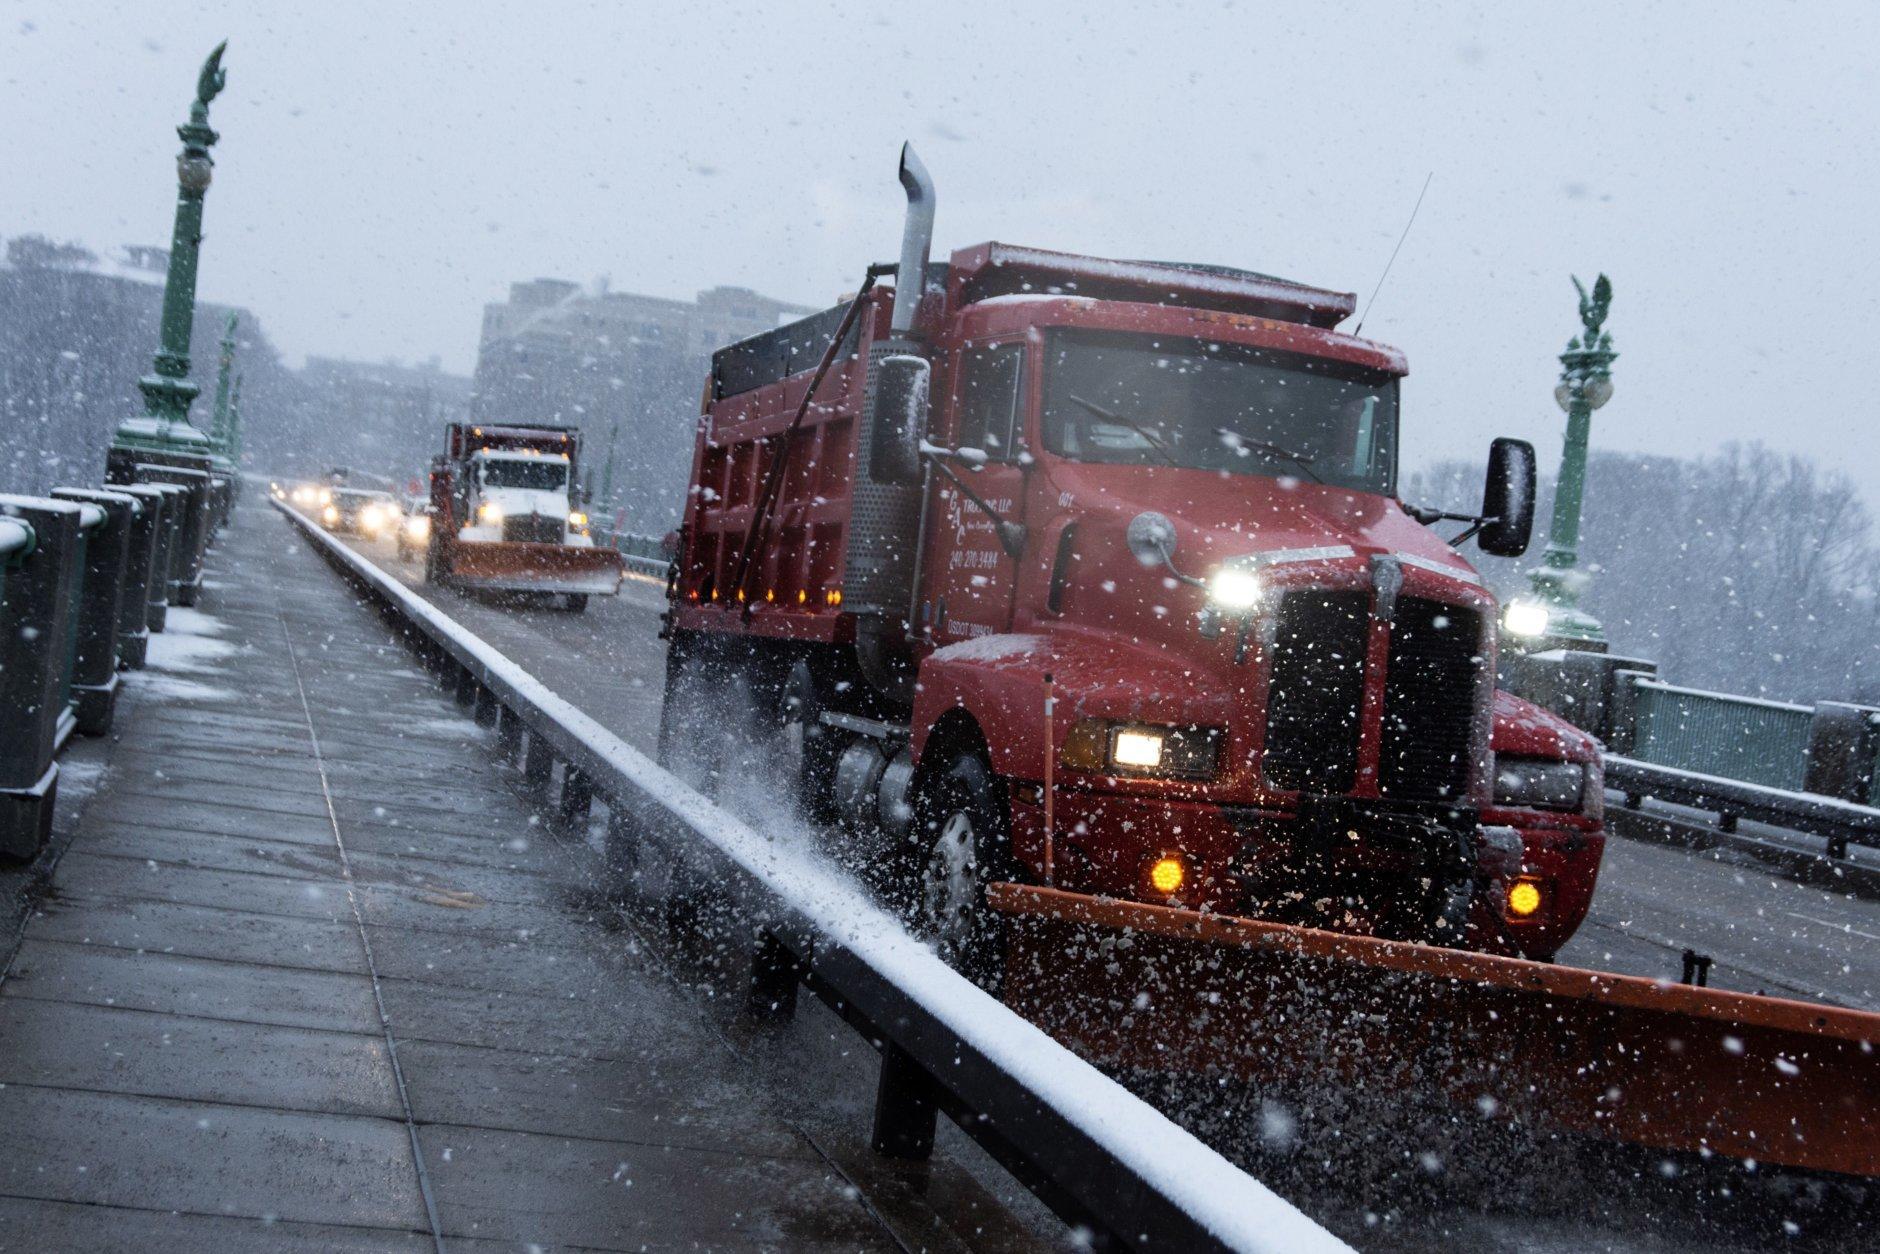 Plows make their way over Rock Creek Park in D.C. (WTOP/Alejandro Alvarez)